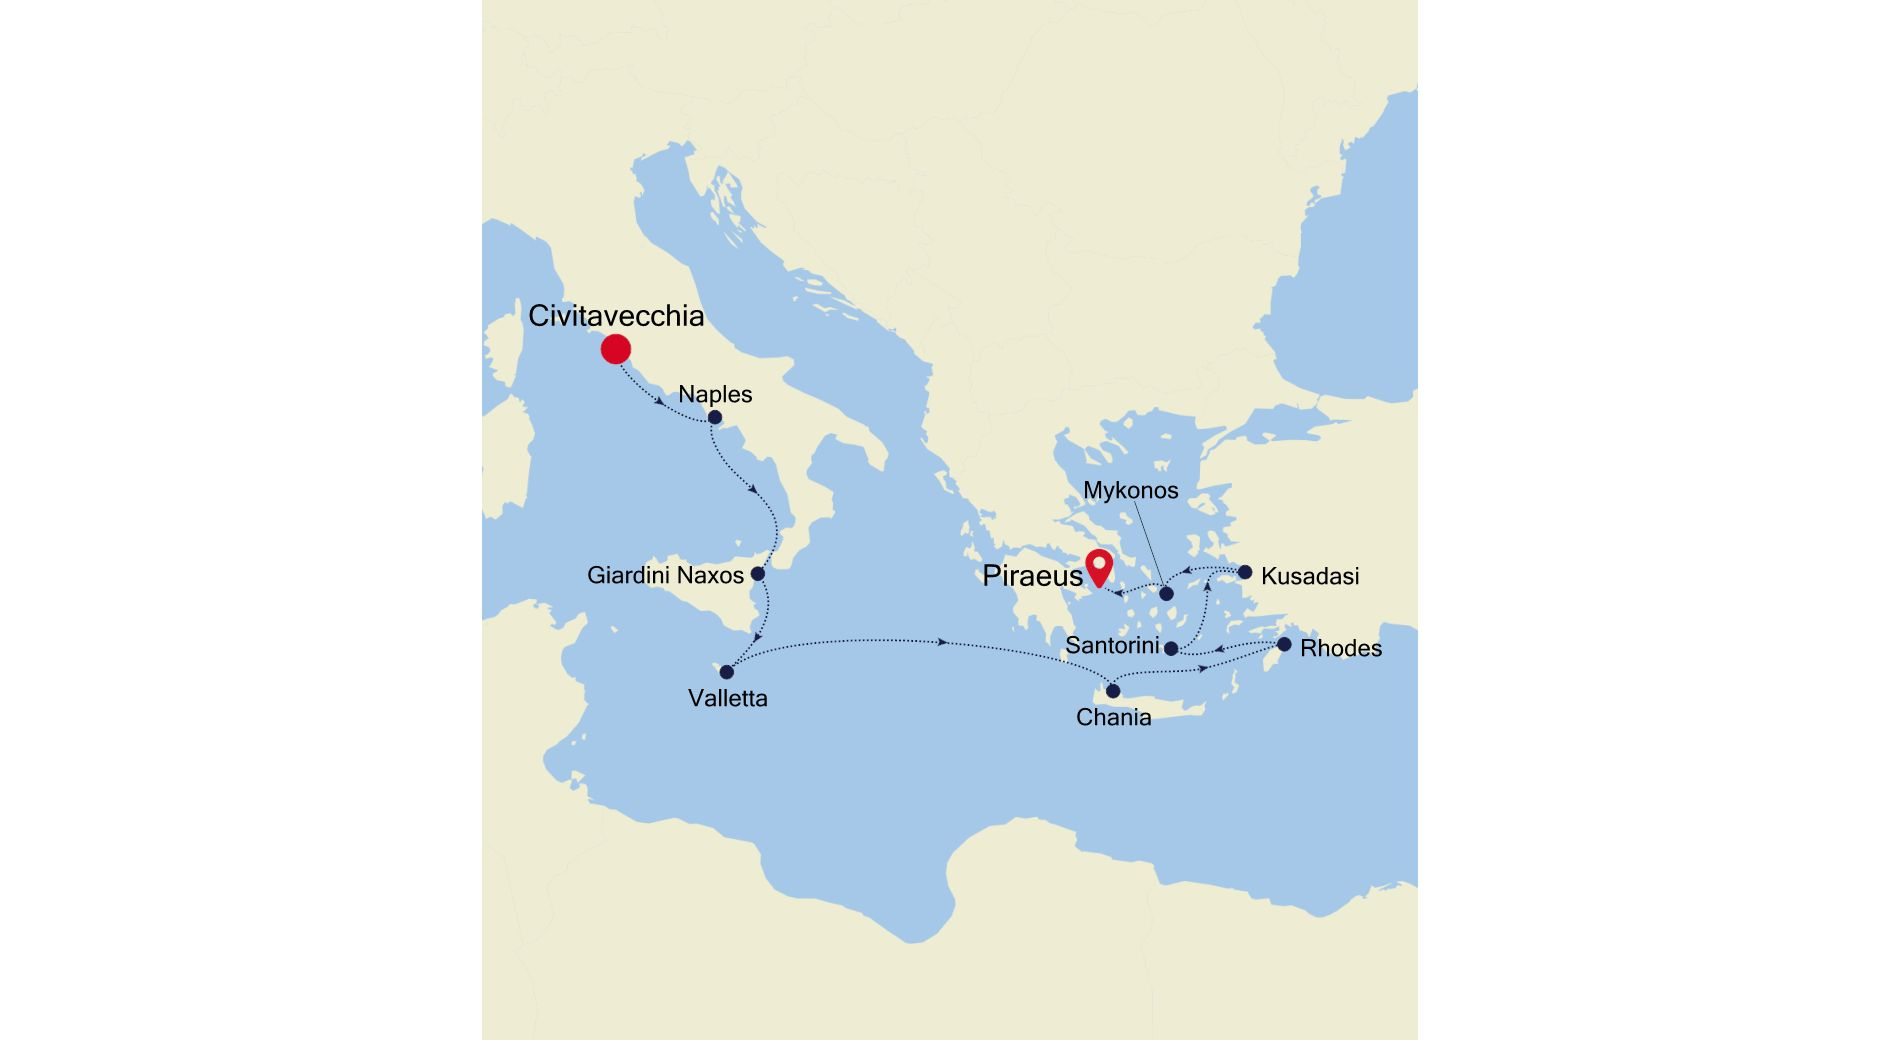 SS201001011 - Civitavecchia nach Athens